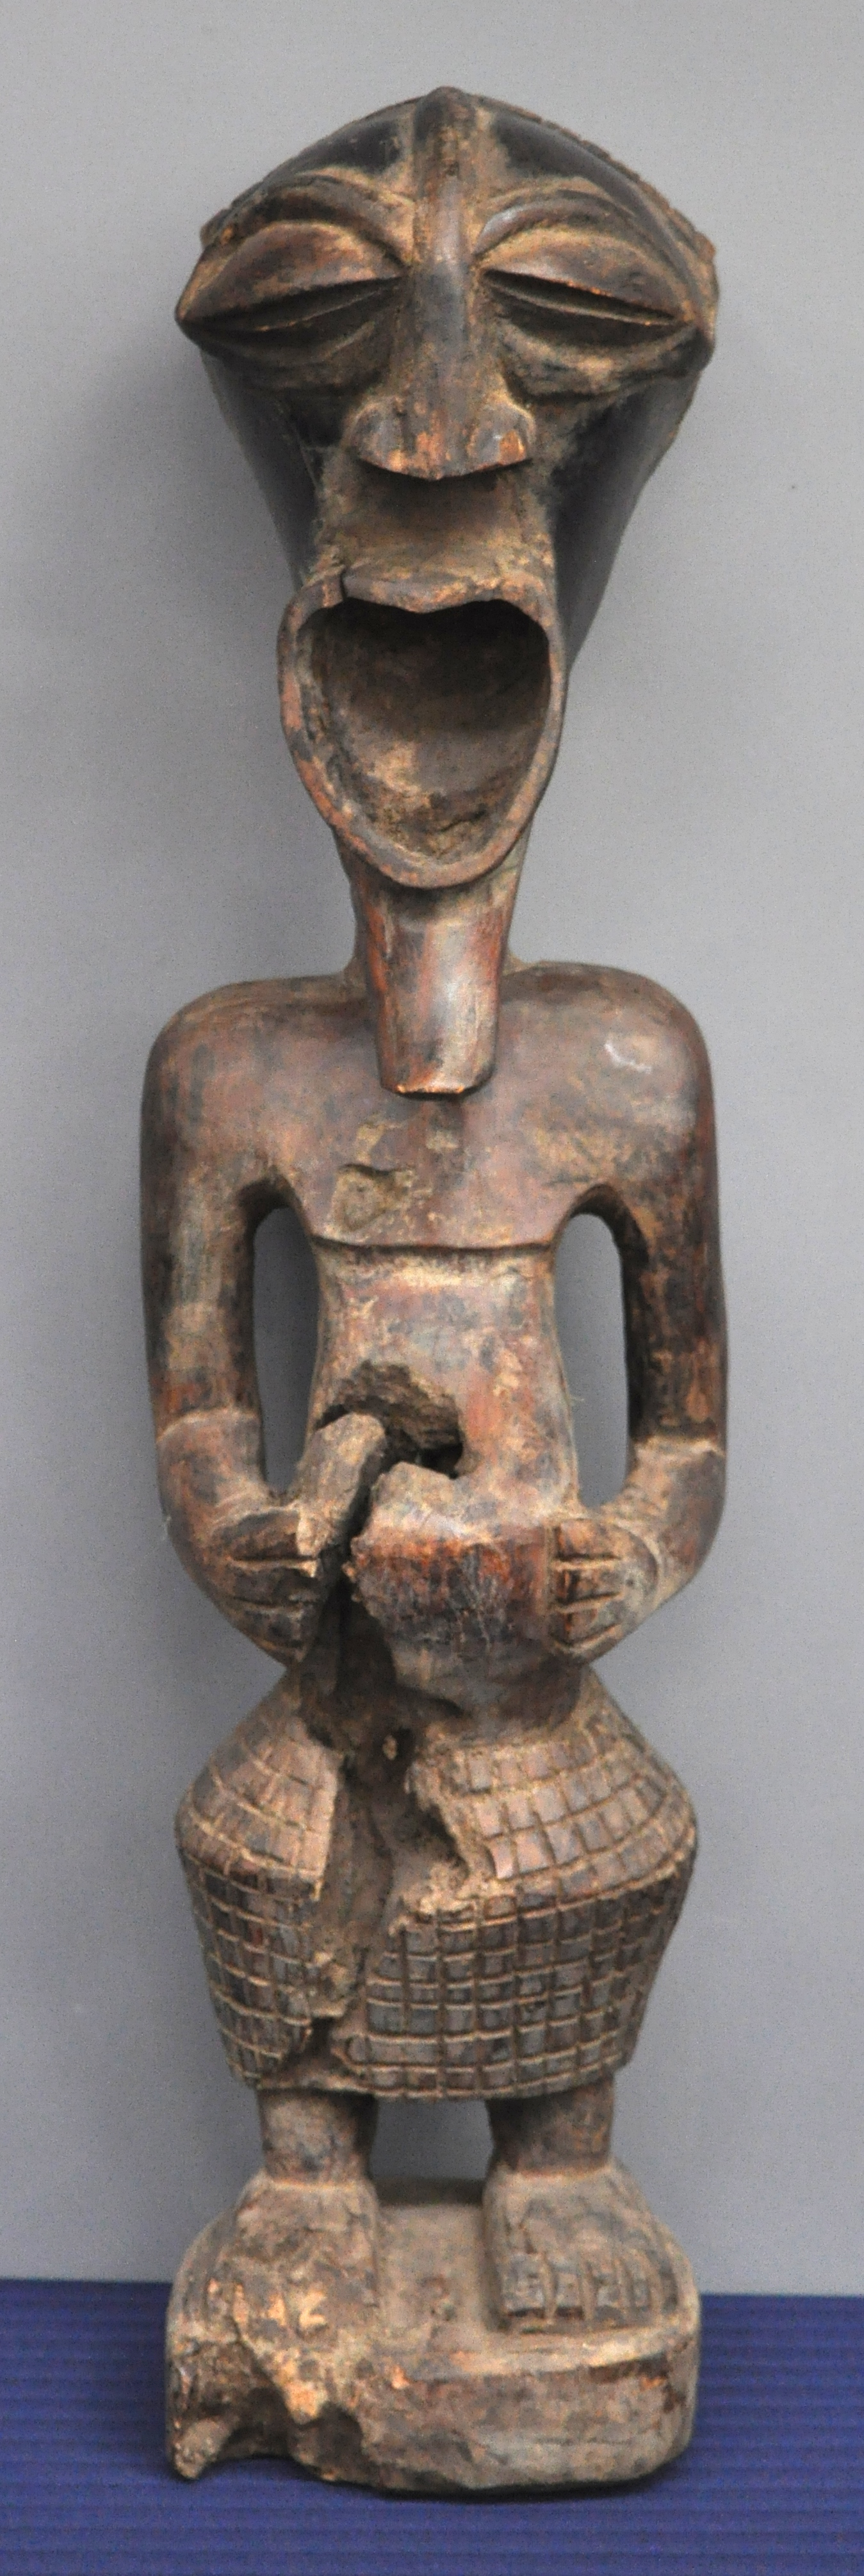 Een afrikaans houten beeld. songye. – jordaens n.v. veilinghuis